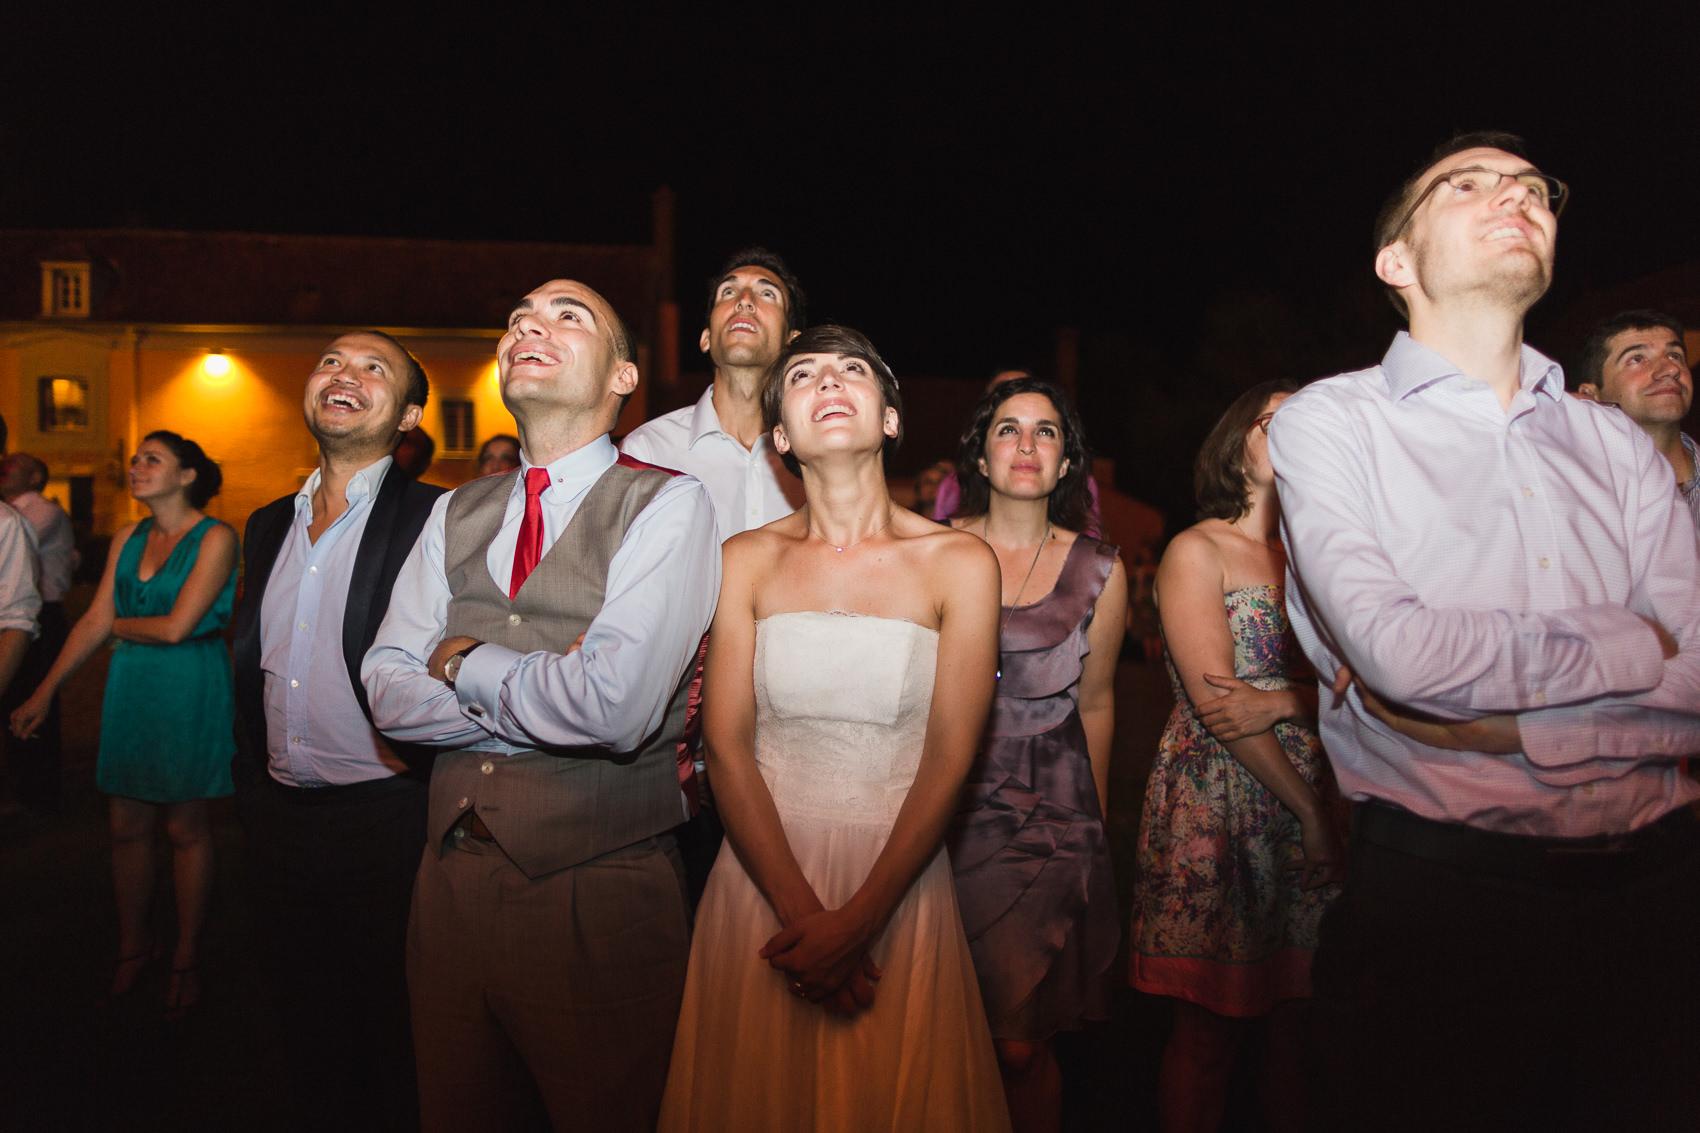 mariage-charlotte-et-joel-trendzphotography-135